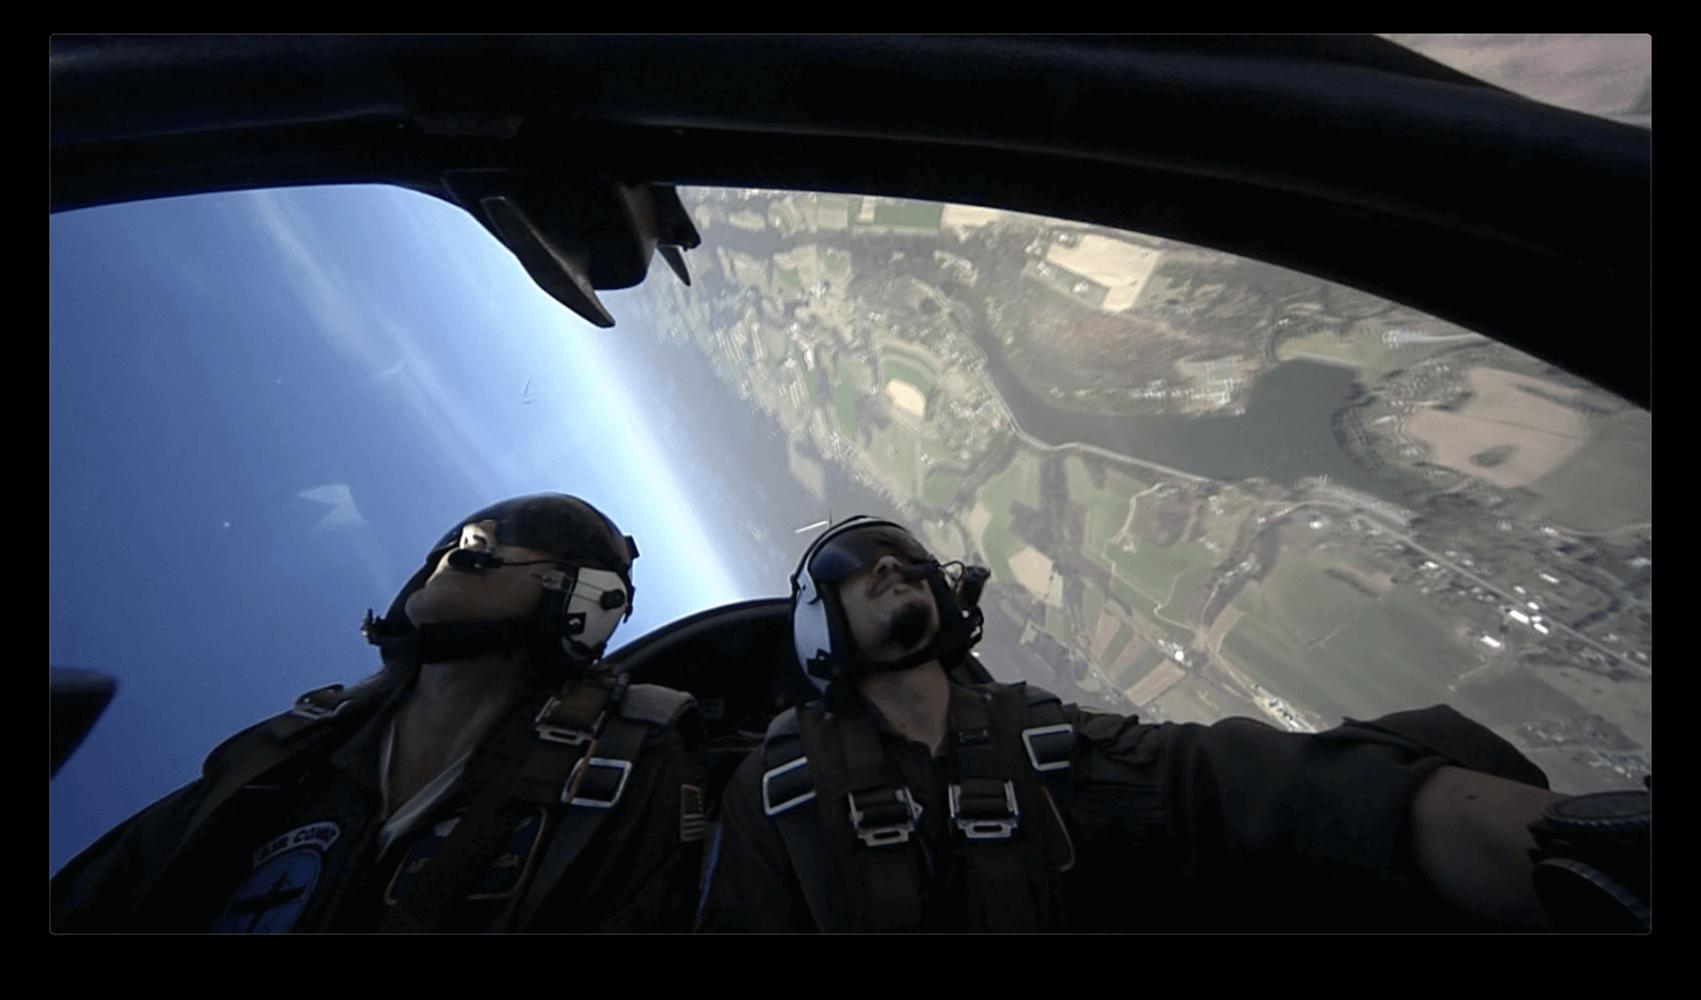 Flying Upside Down